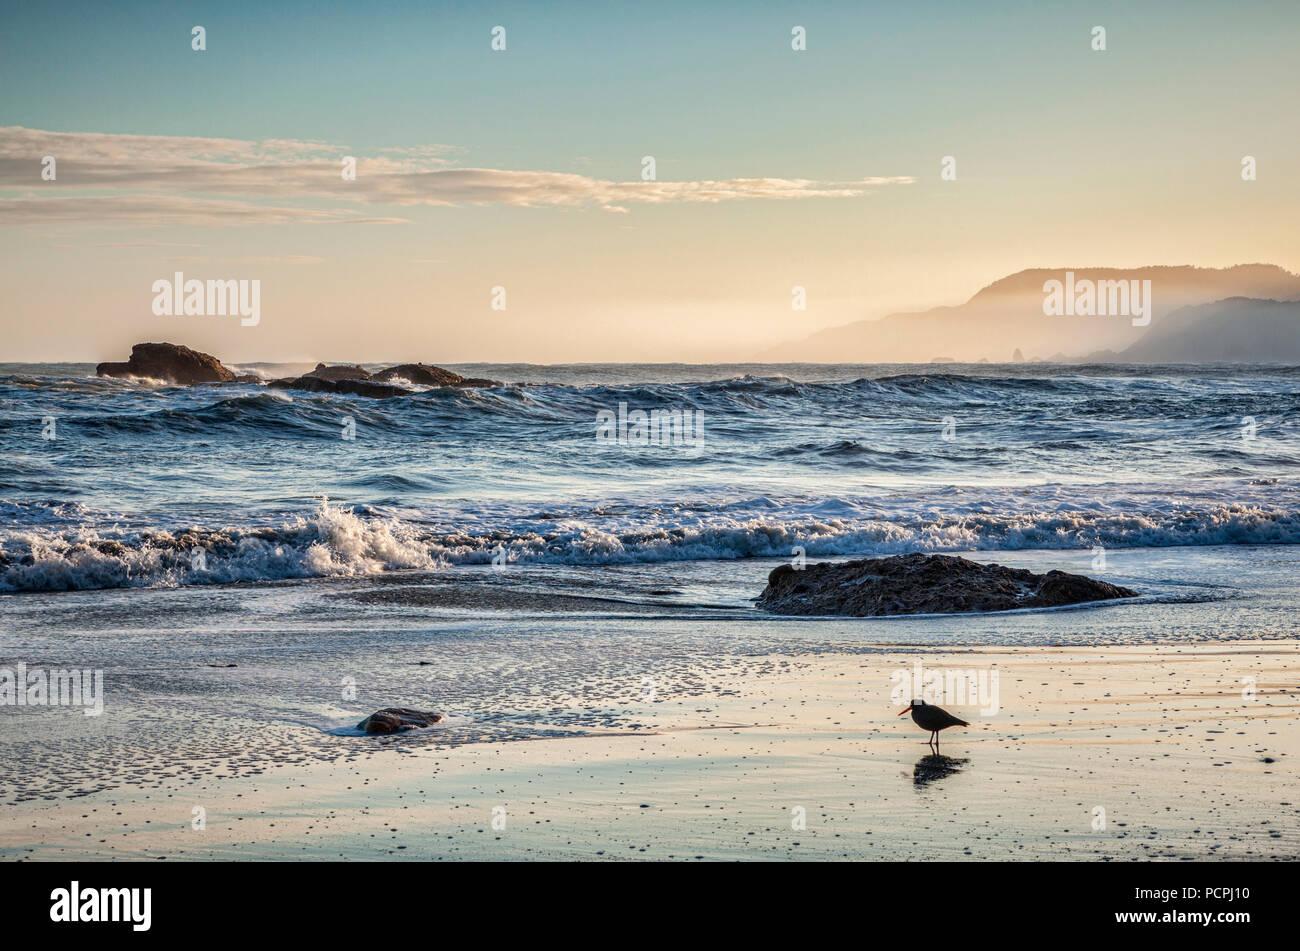 A lone oystercatcher hunts for breakfast on a wild morning at Woodpecker Bay, Paparoa National Park, West Coast, New Zealand. - Stock Image